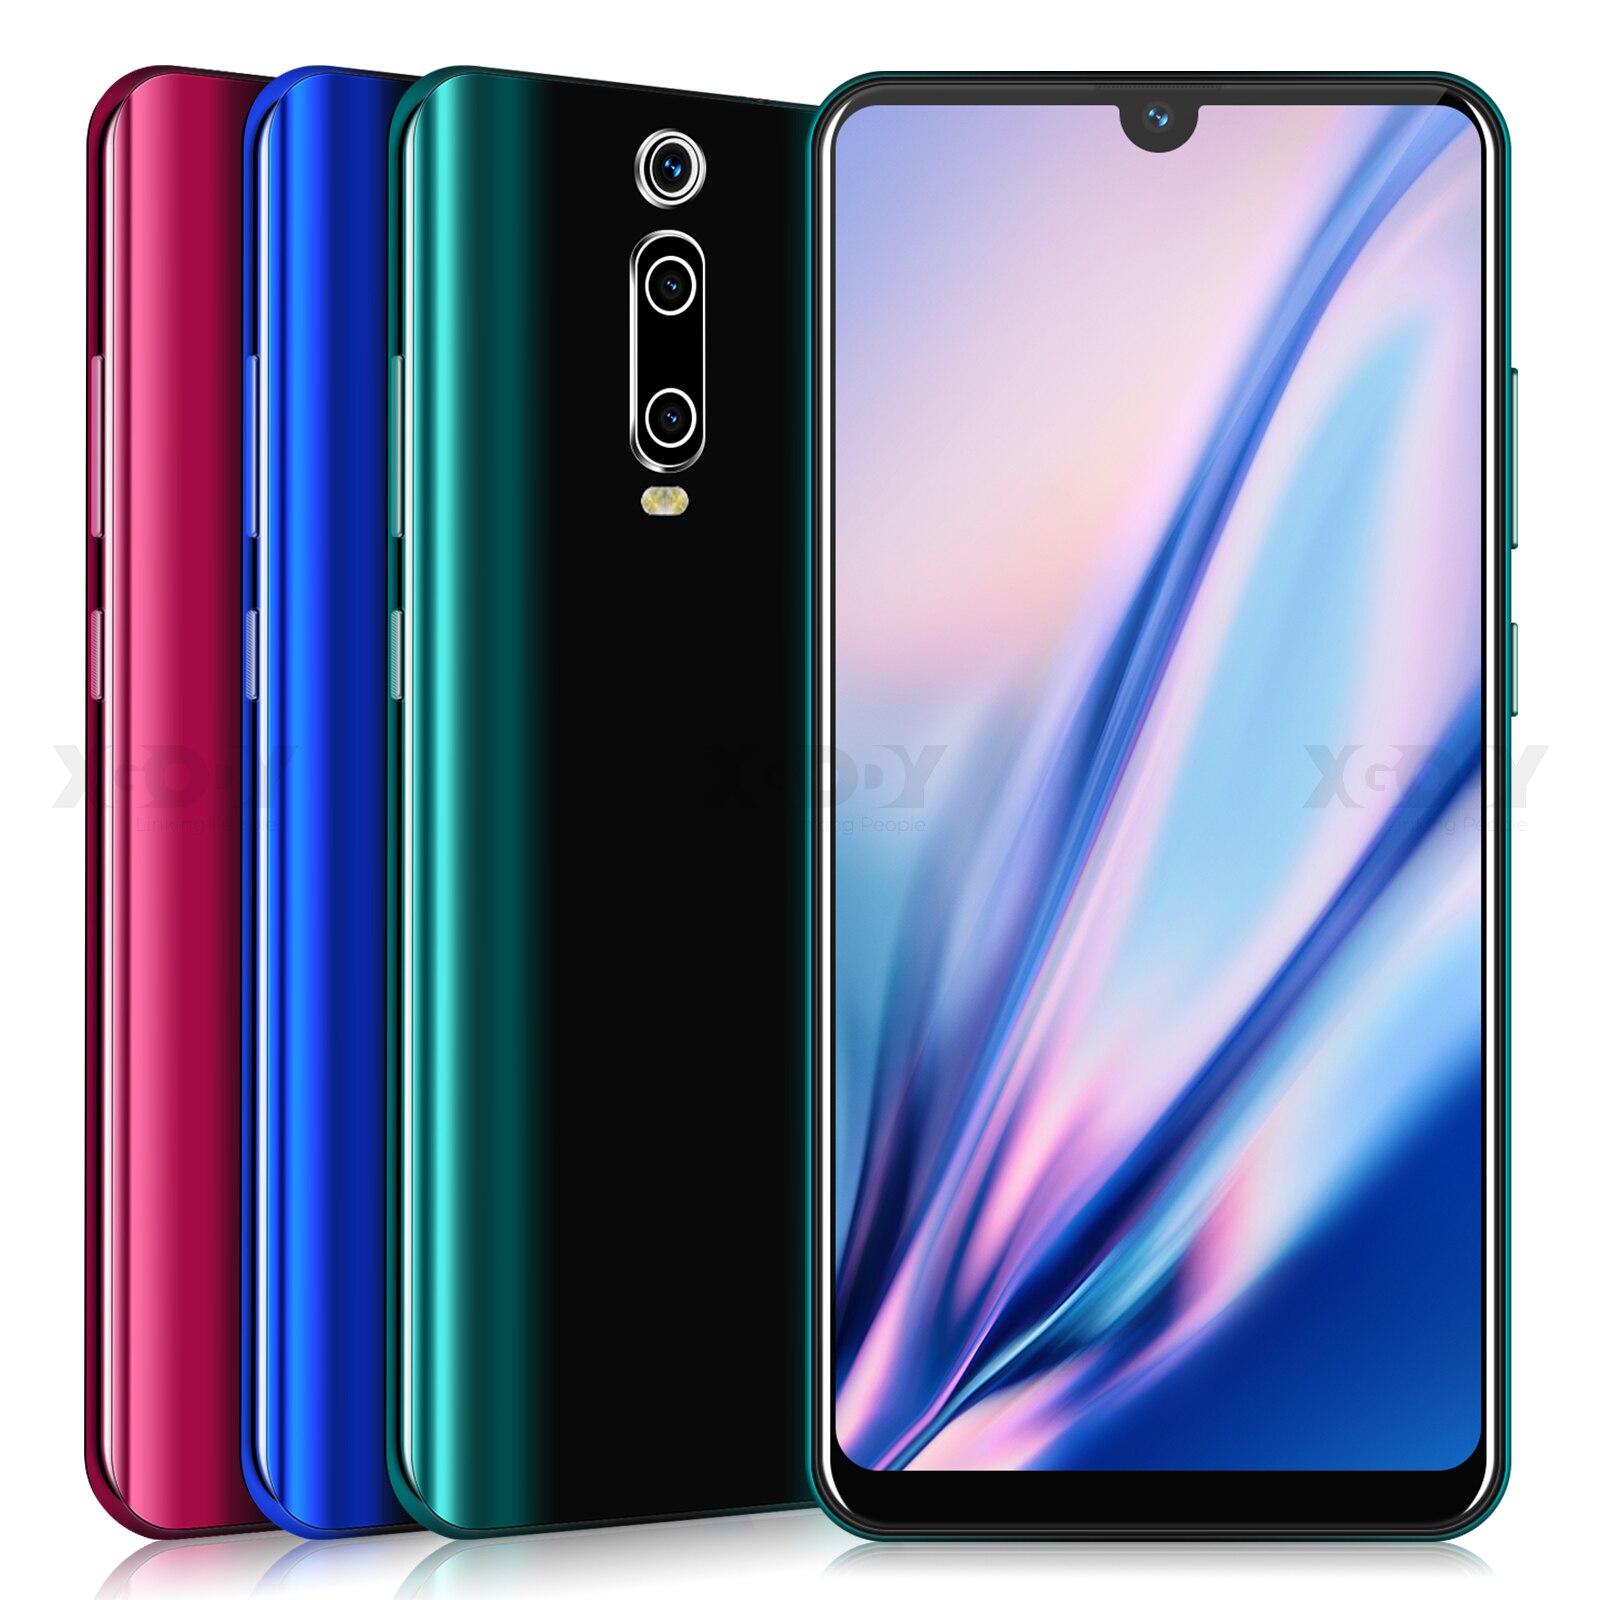 XGODY 3G téléphone portable 9T 1GB 4GB 6.26 ''QHD écran MTK6580 Quad Core Android 9.0 Waterdrop plein écran 2800mAh Smartphone